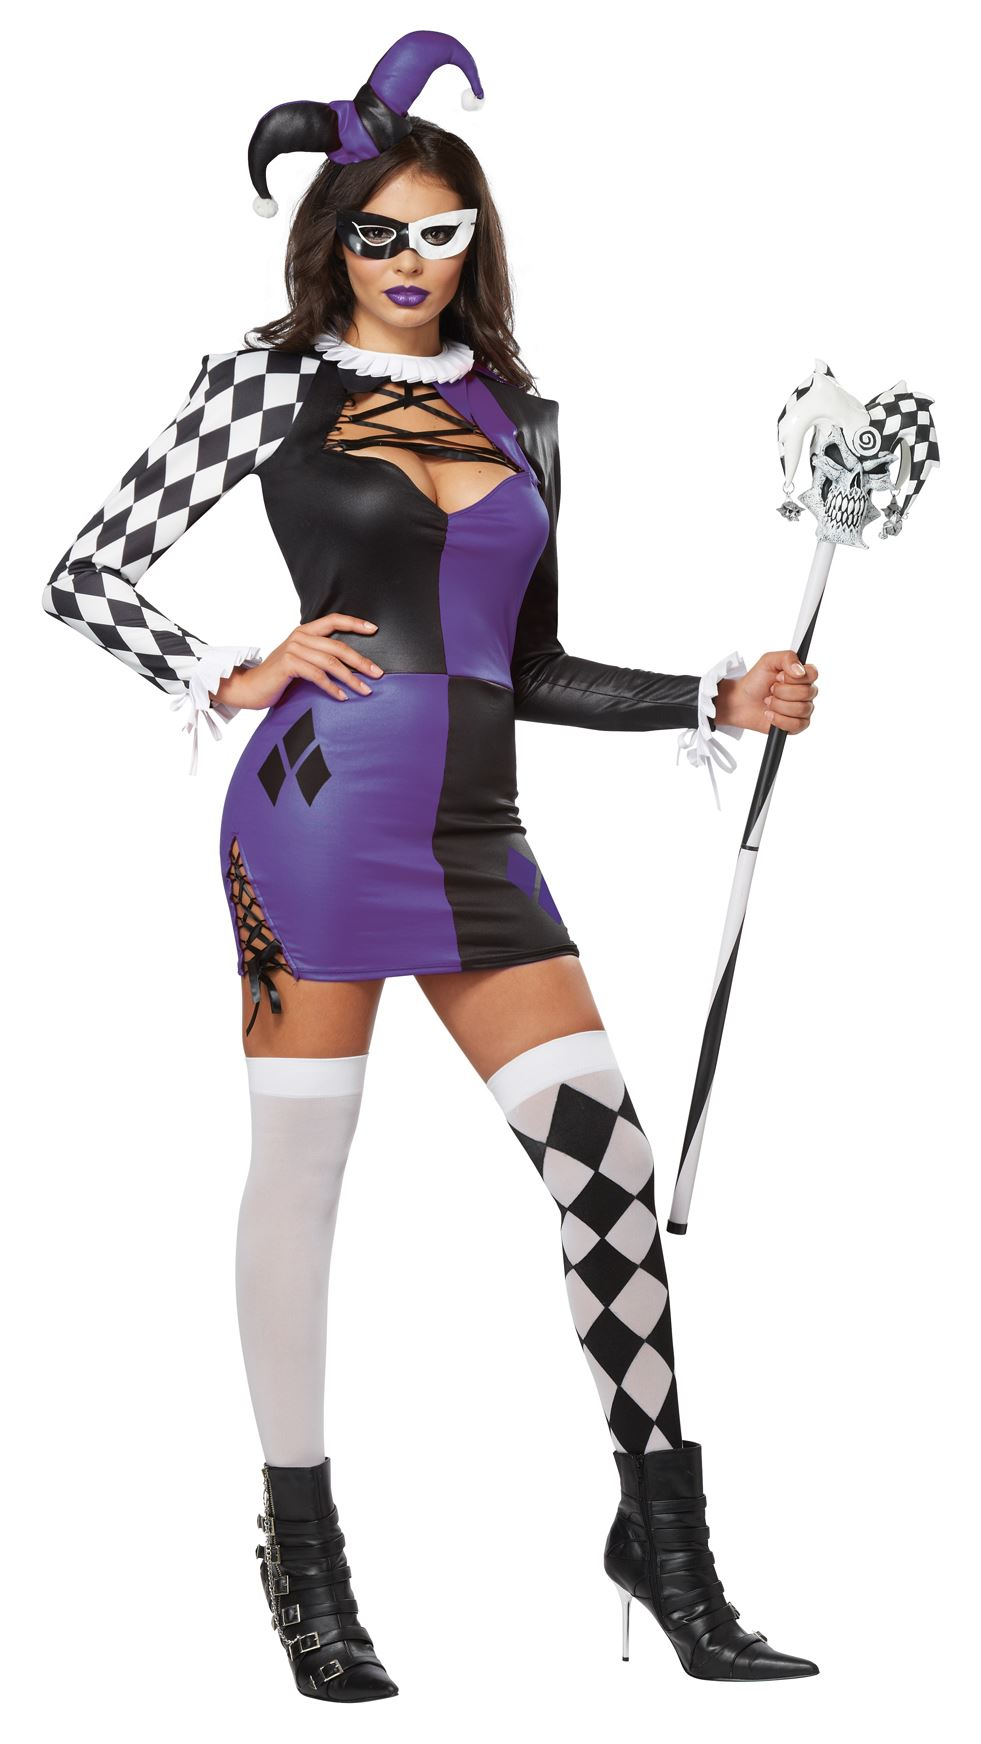 Adult Naughty Jester Women Halloween Costume | $31.99 | The ...